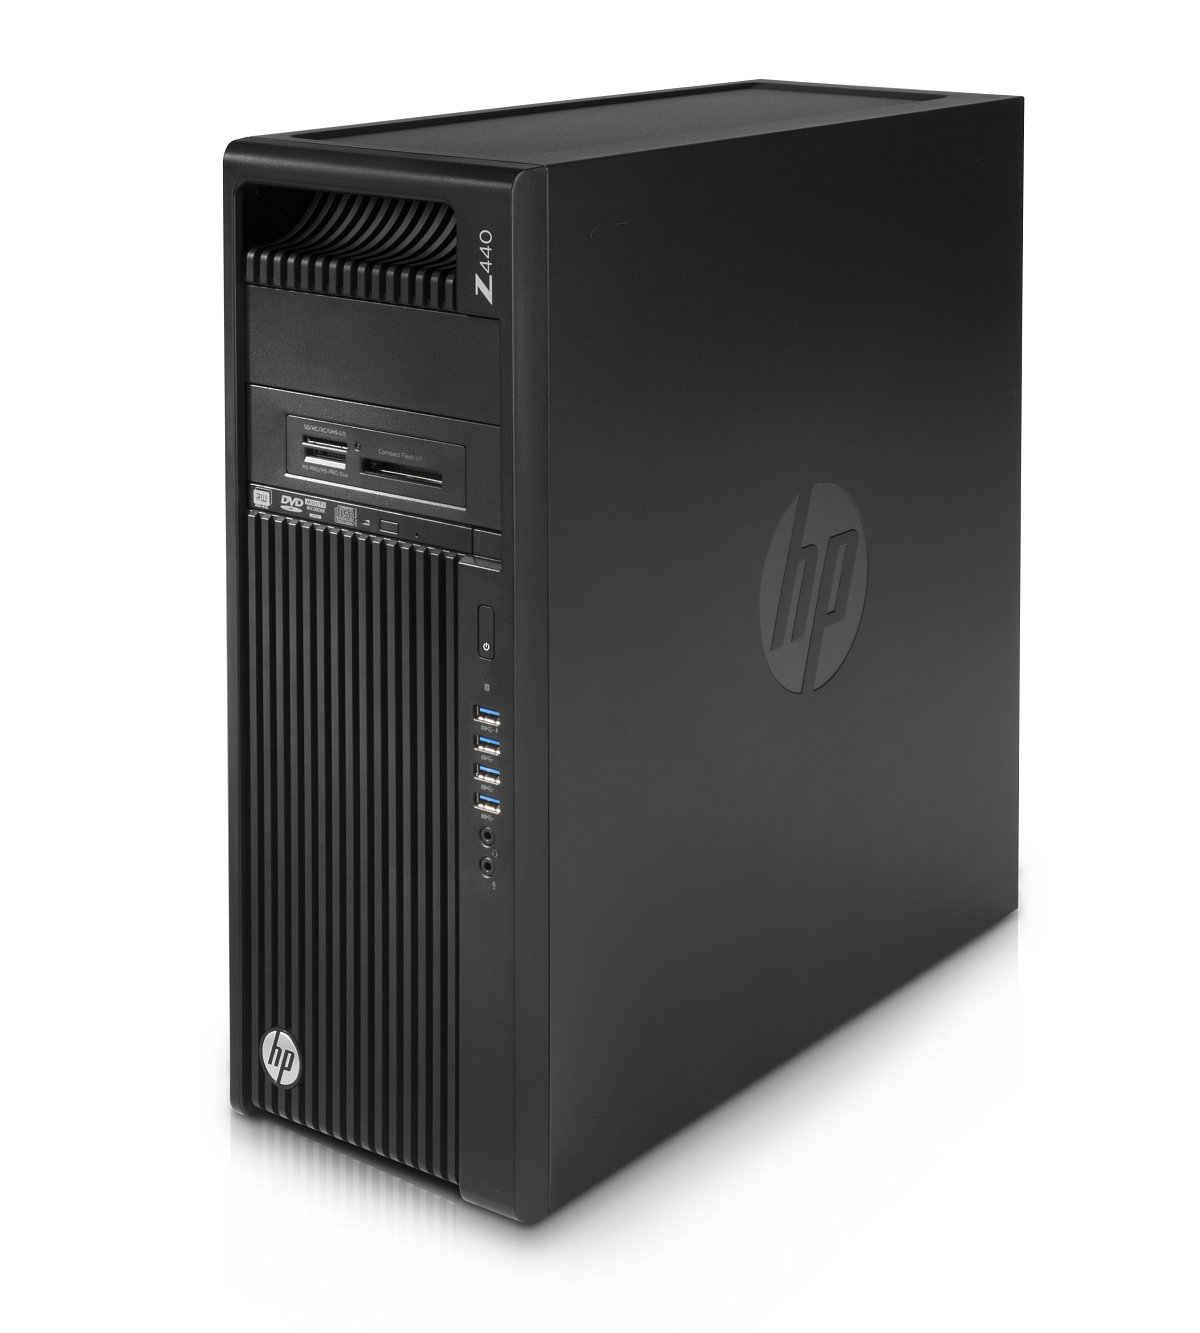 HP Z440 Xeon® E5-1620 v4 / 16 GB DDR4-2400 / 256 GB SSD / Win 10 Pro